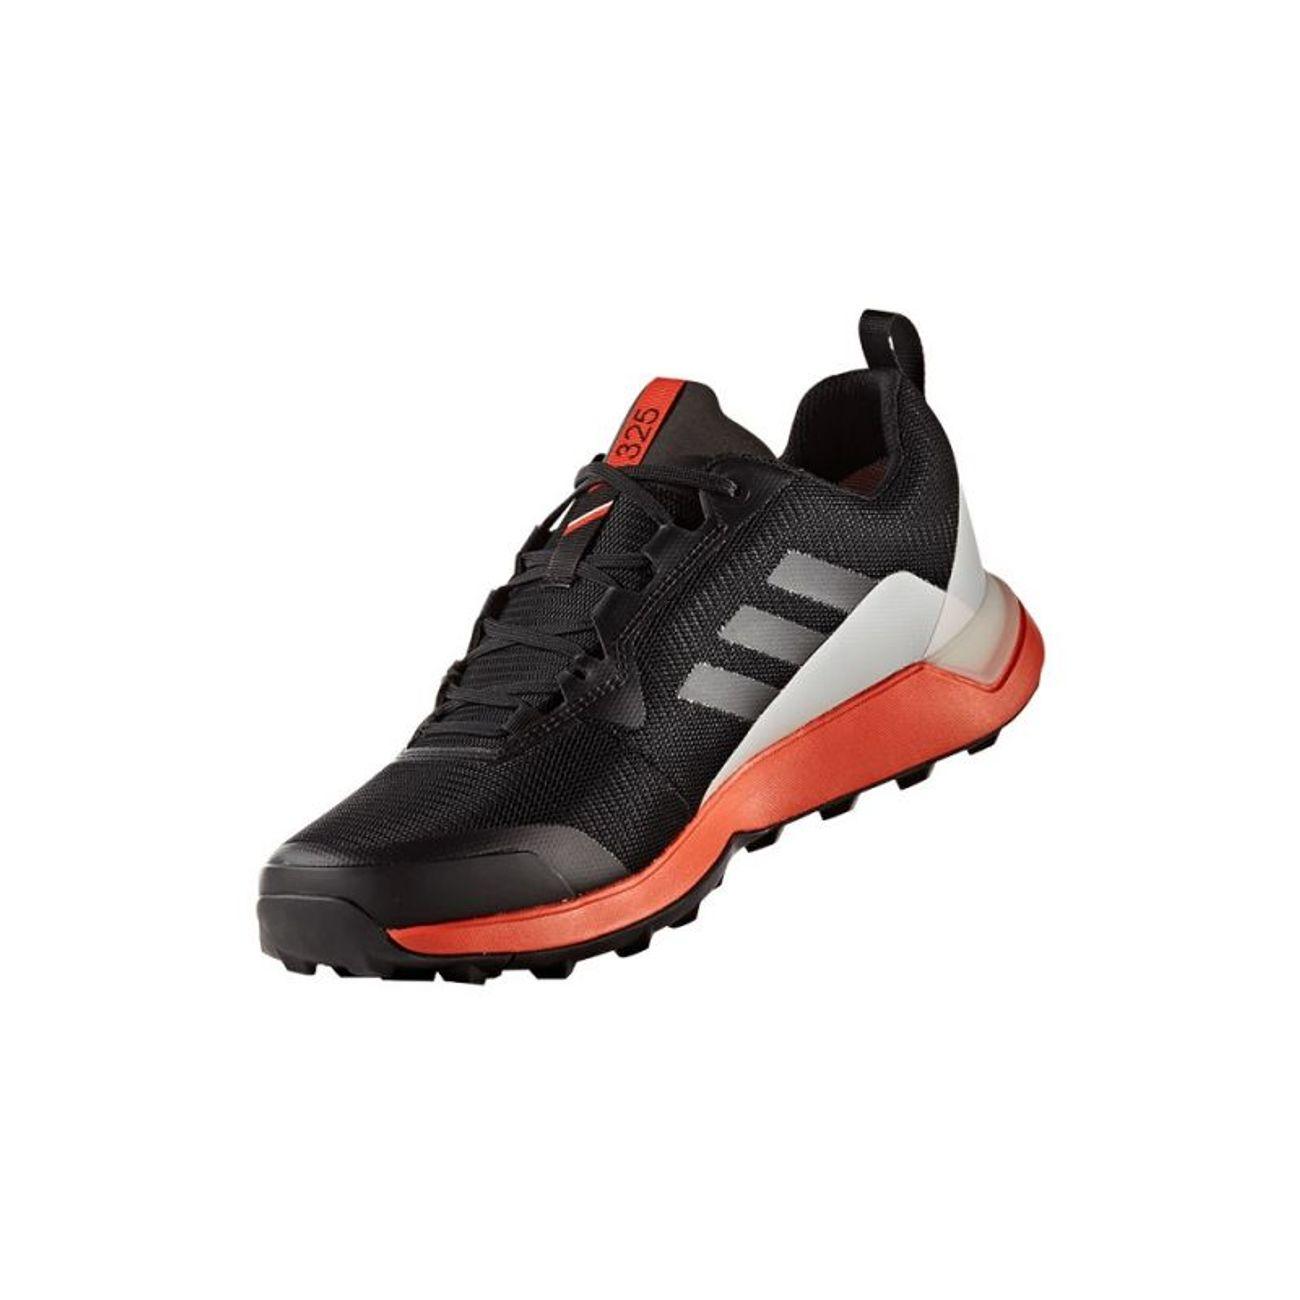 Randonnée homme ADIDAS Adidas Terrex CMTK GTX Hommes Trail Running Shoe (noirrouge)